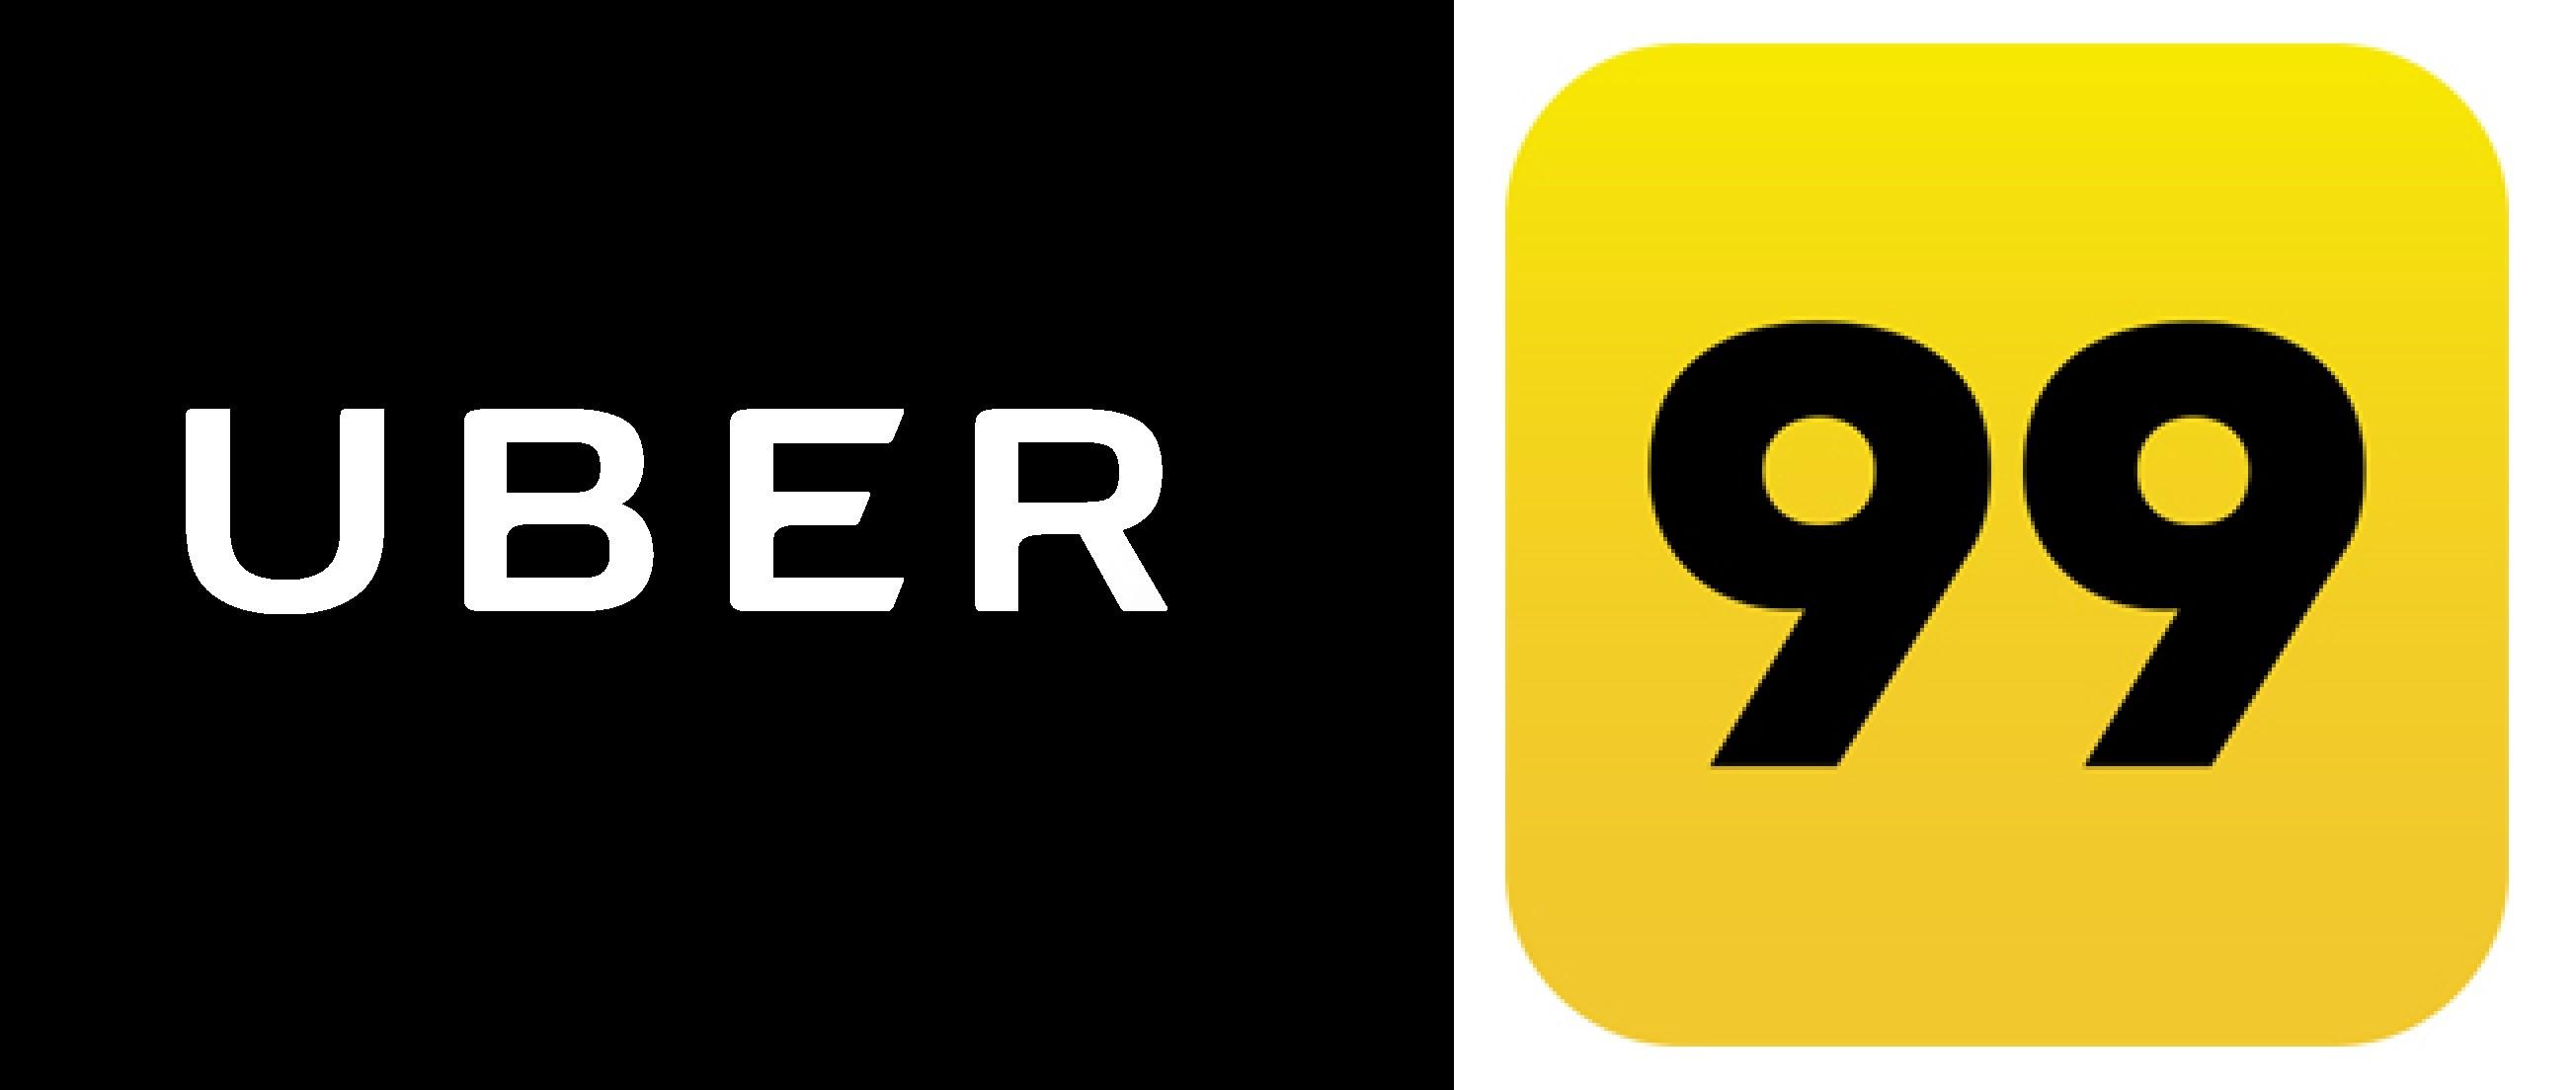 Uber e 99